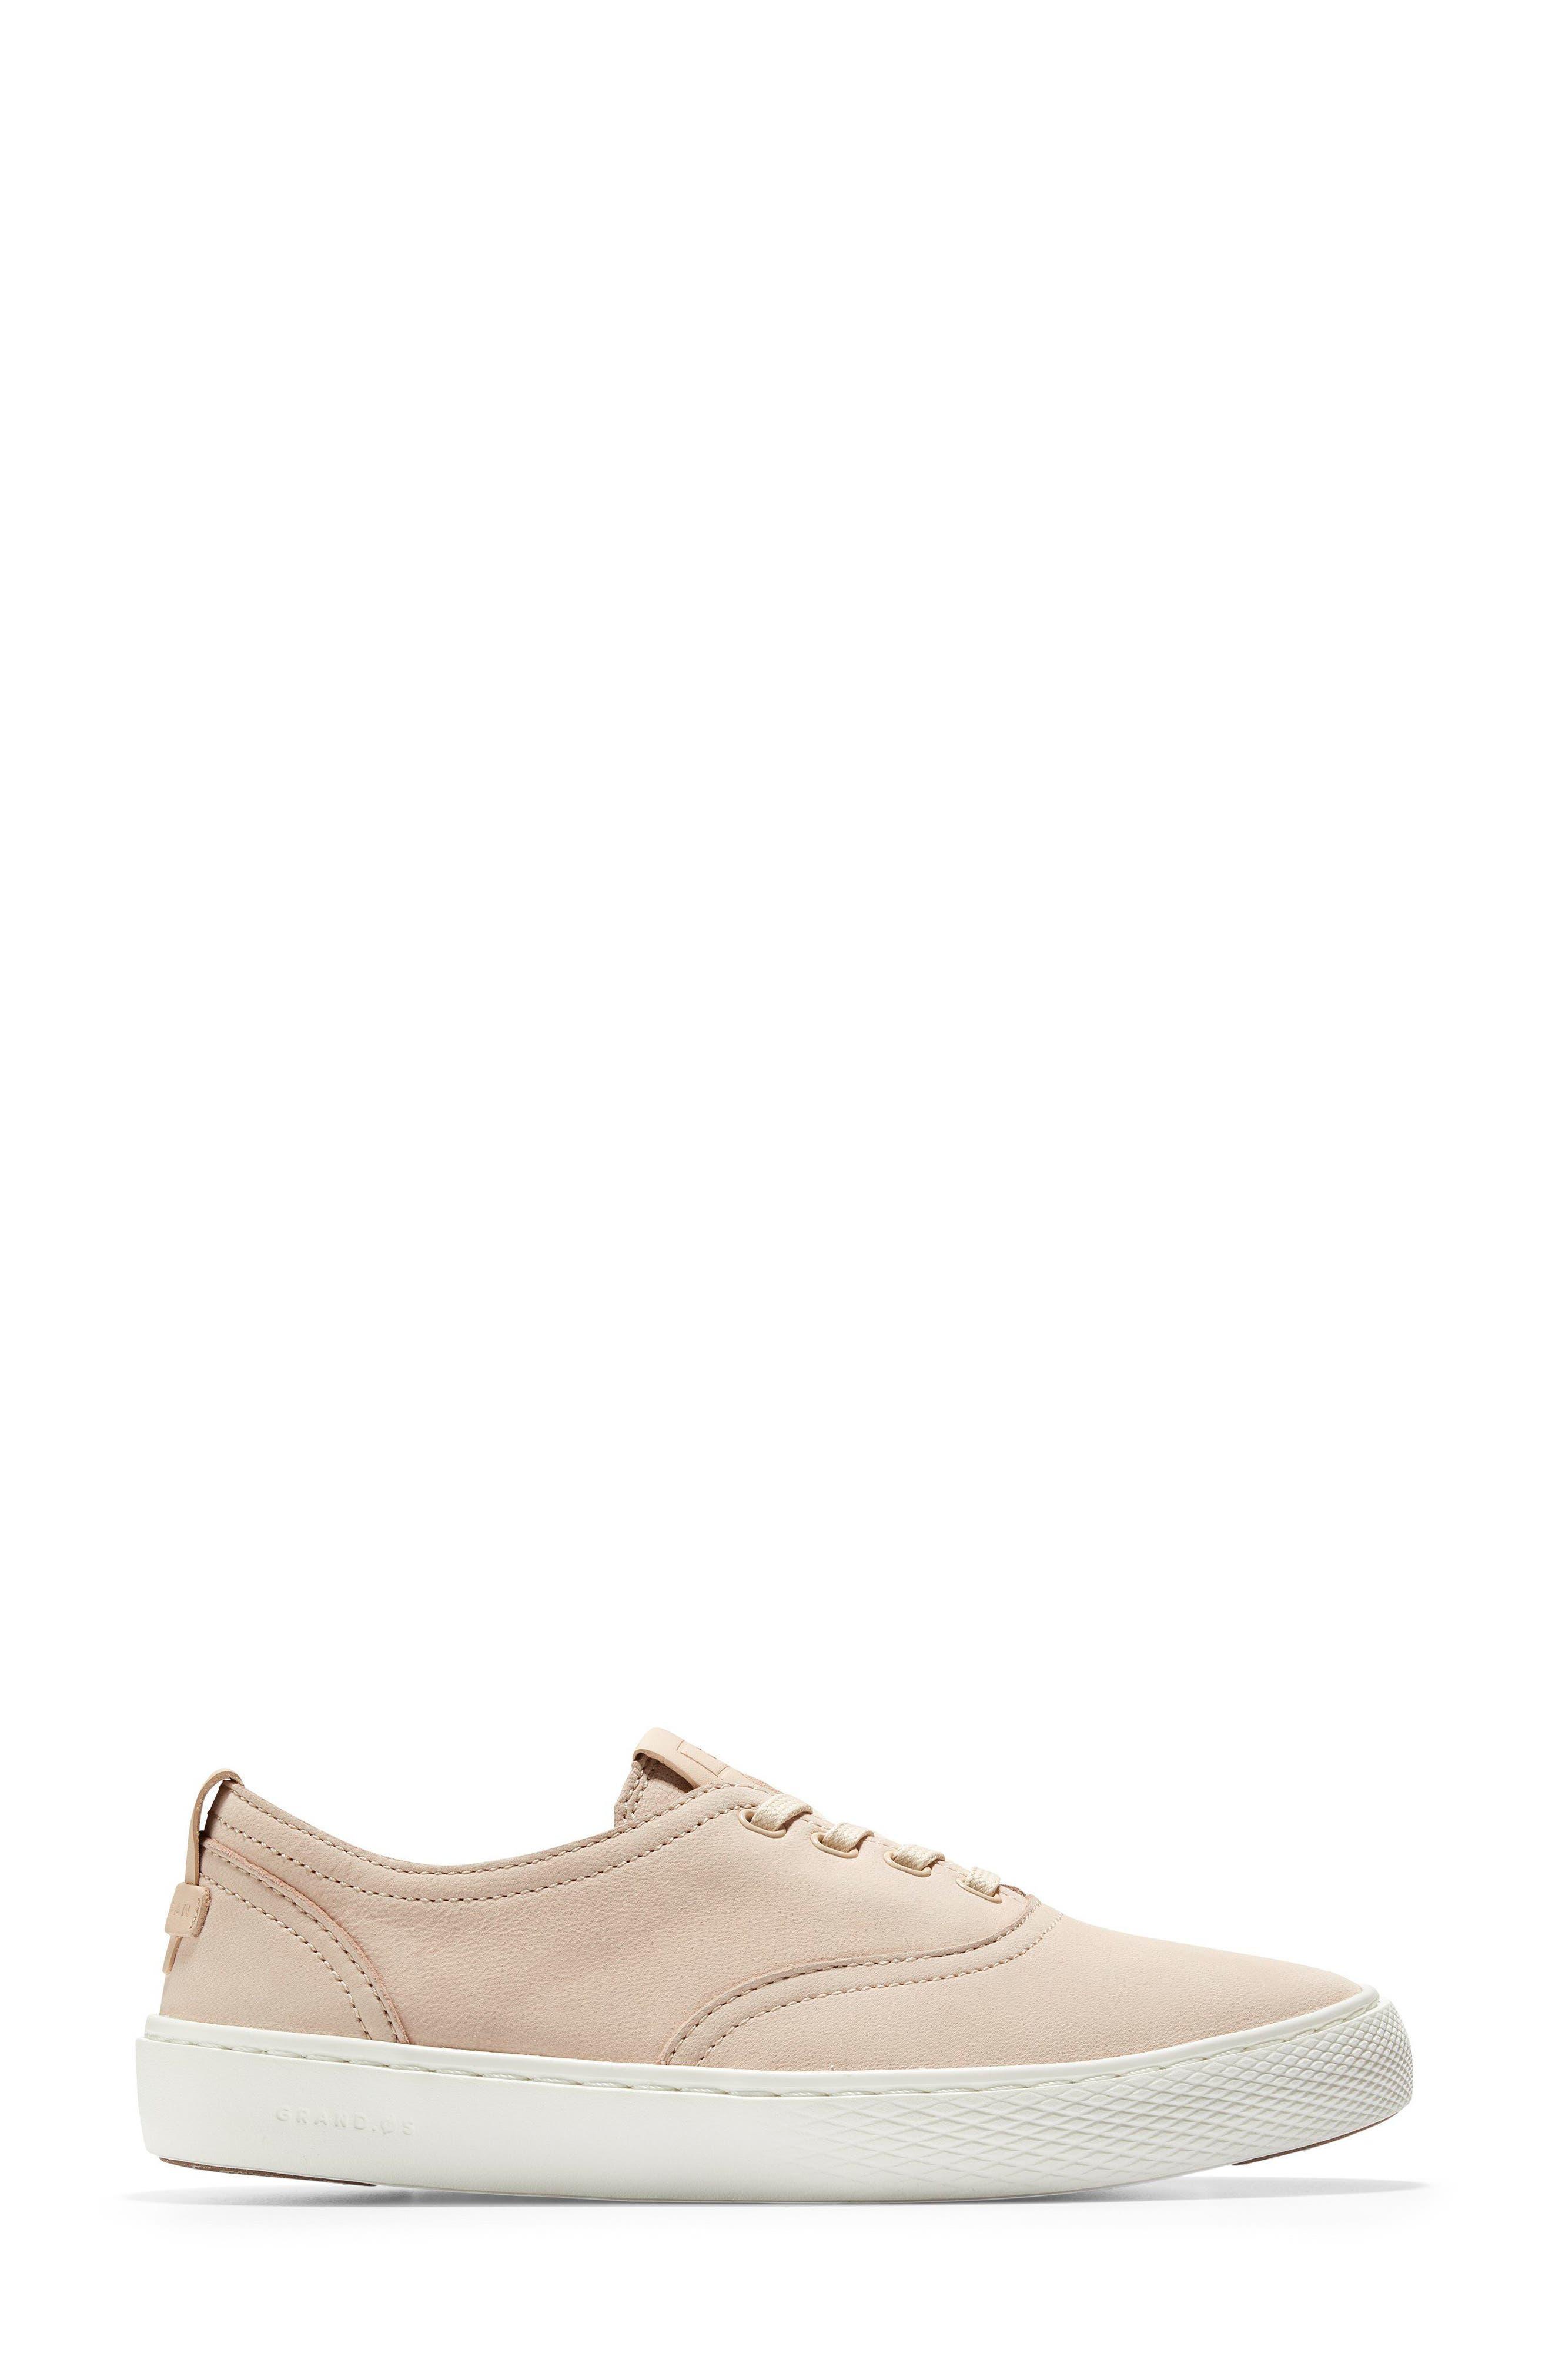 GrandPro Deck Sneaker,                             Alternate thumbnail 3, color,                             250